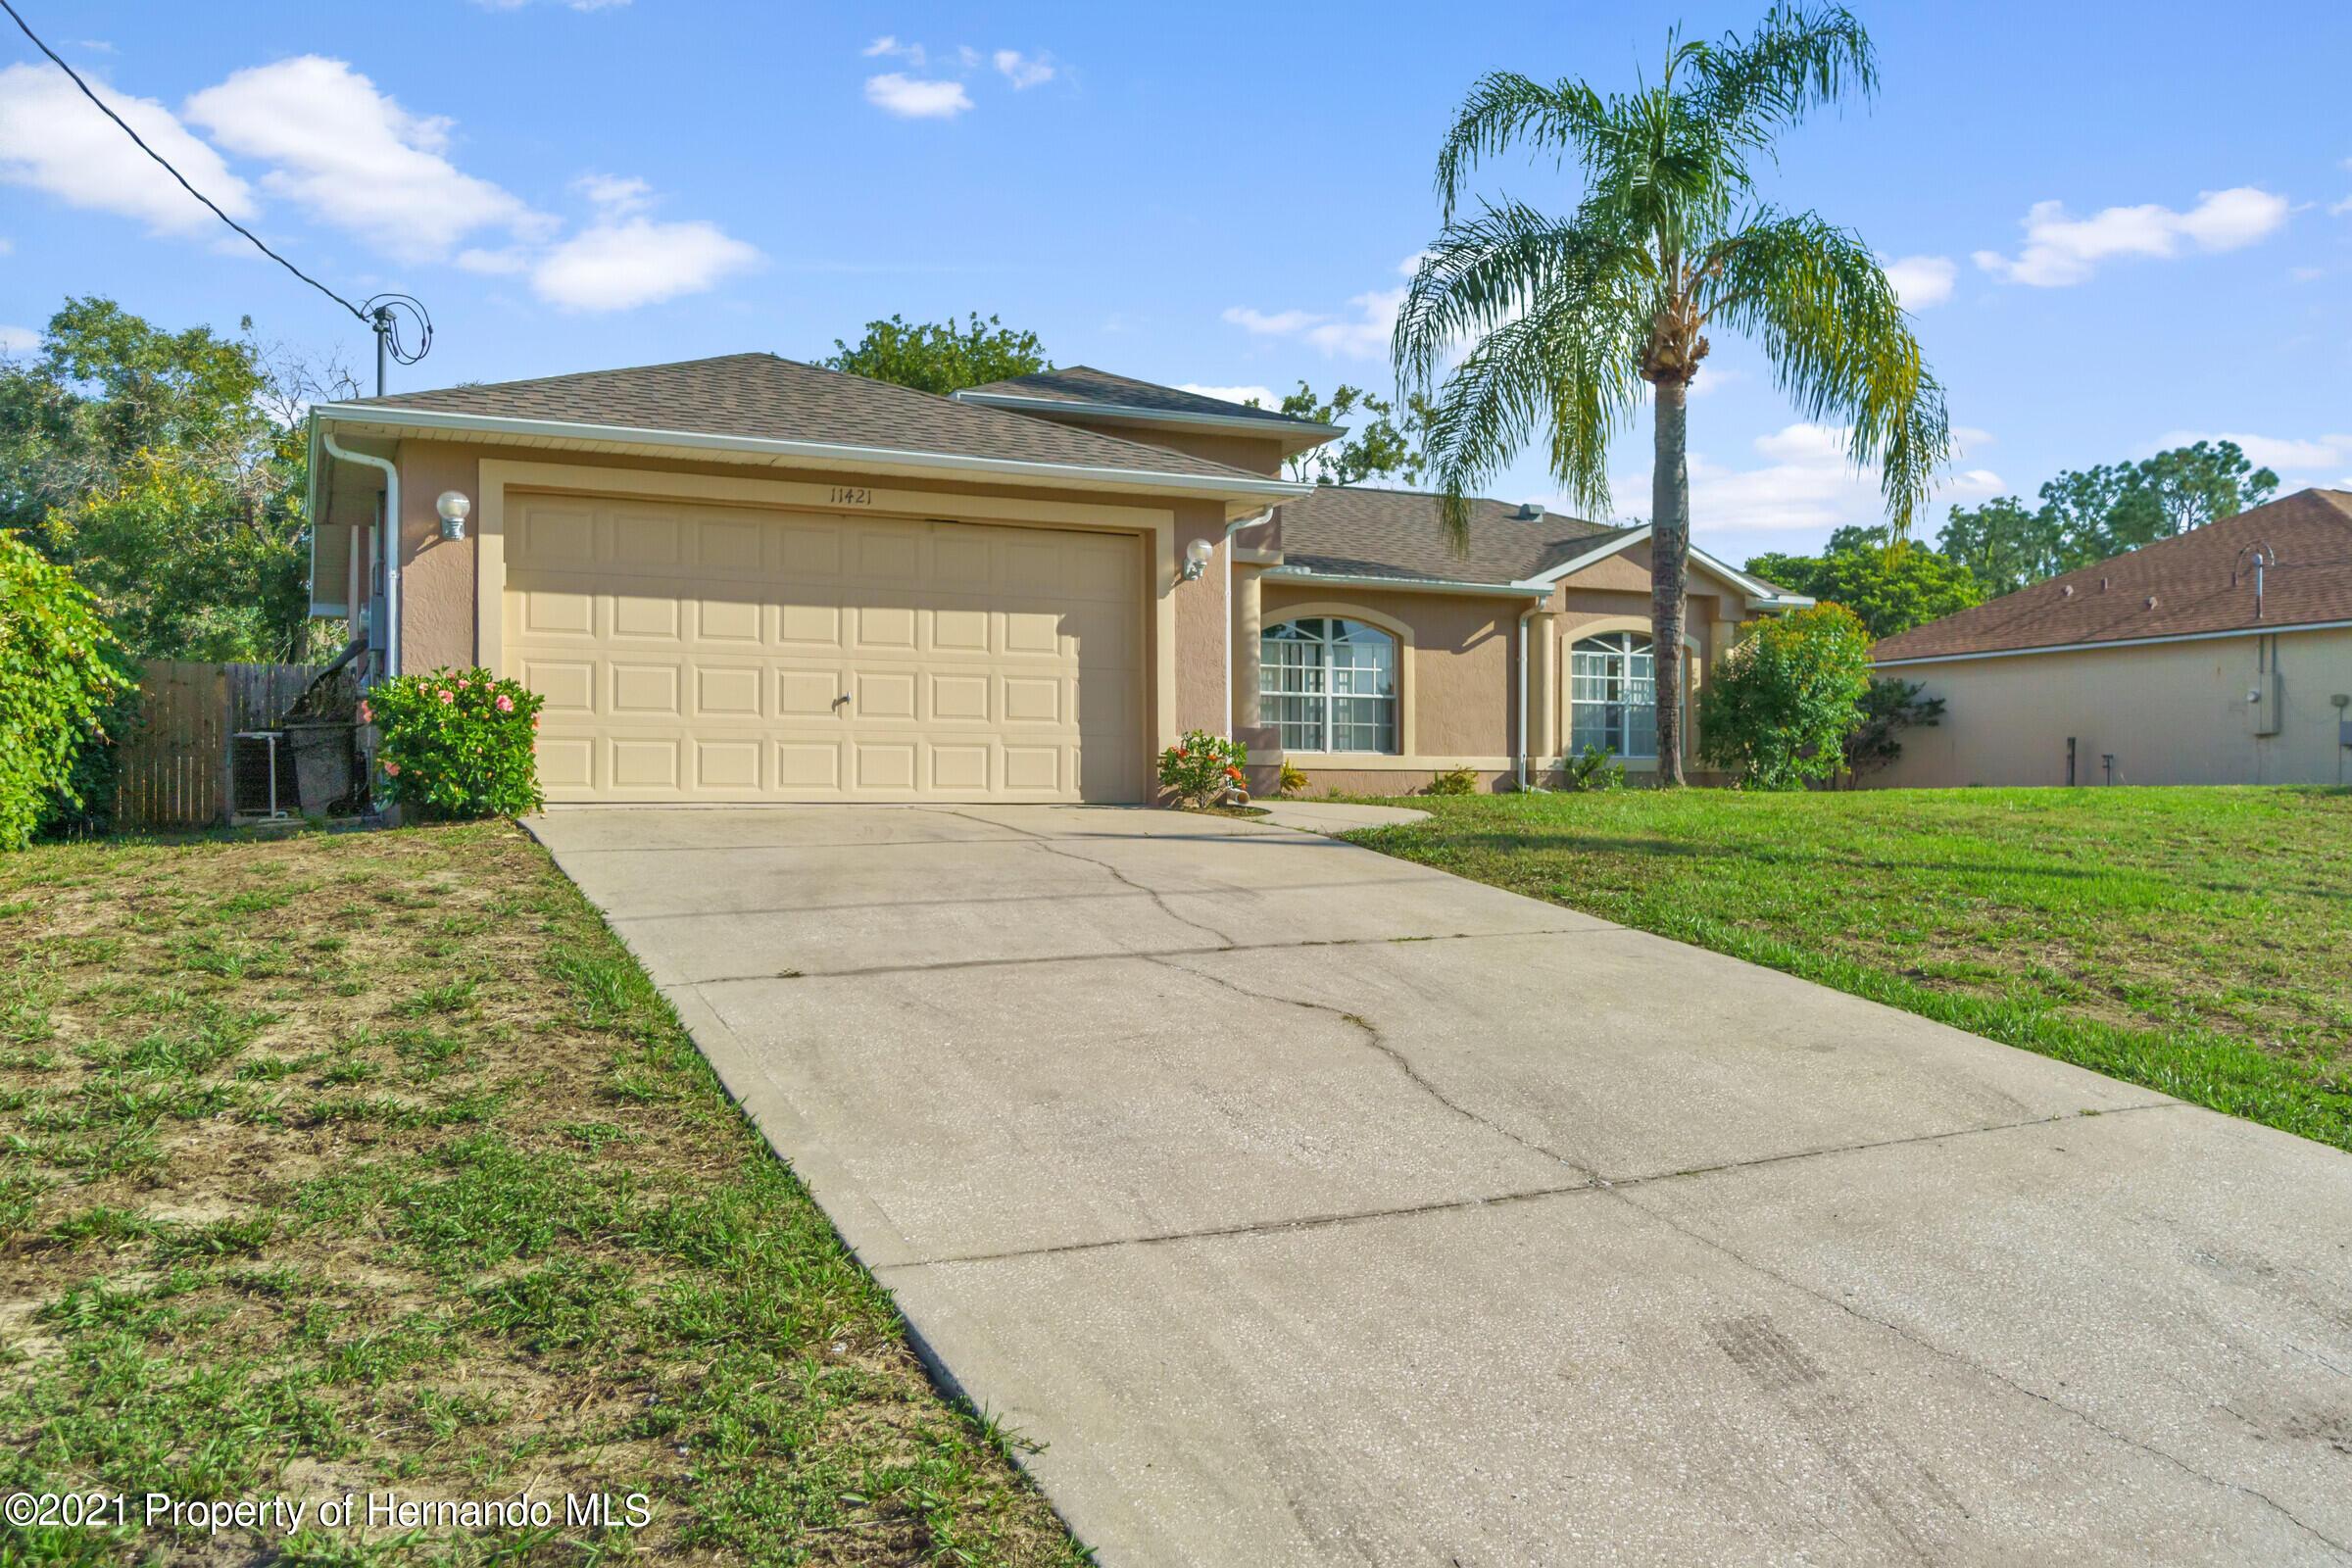 Details for 11421 Tuscanny Avenue, Spring Hill, FL 34608